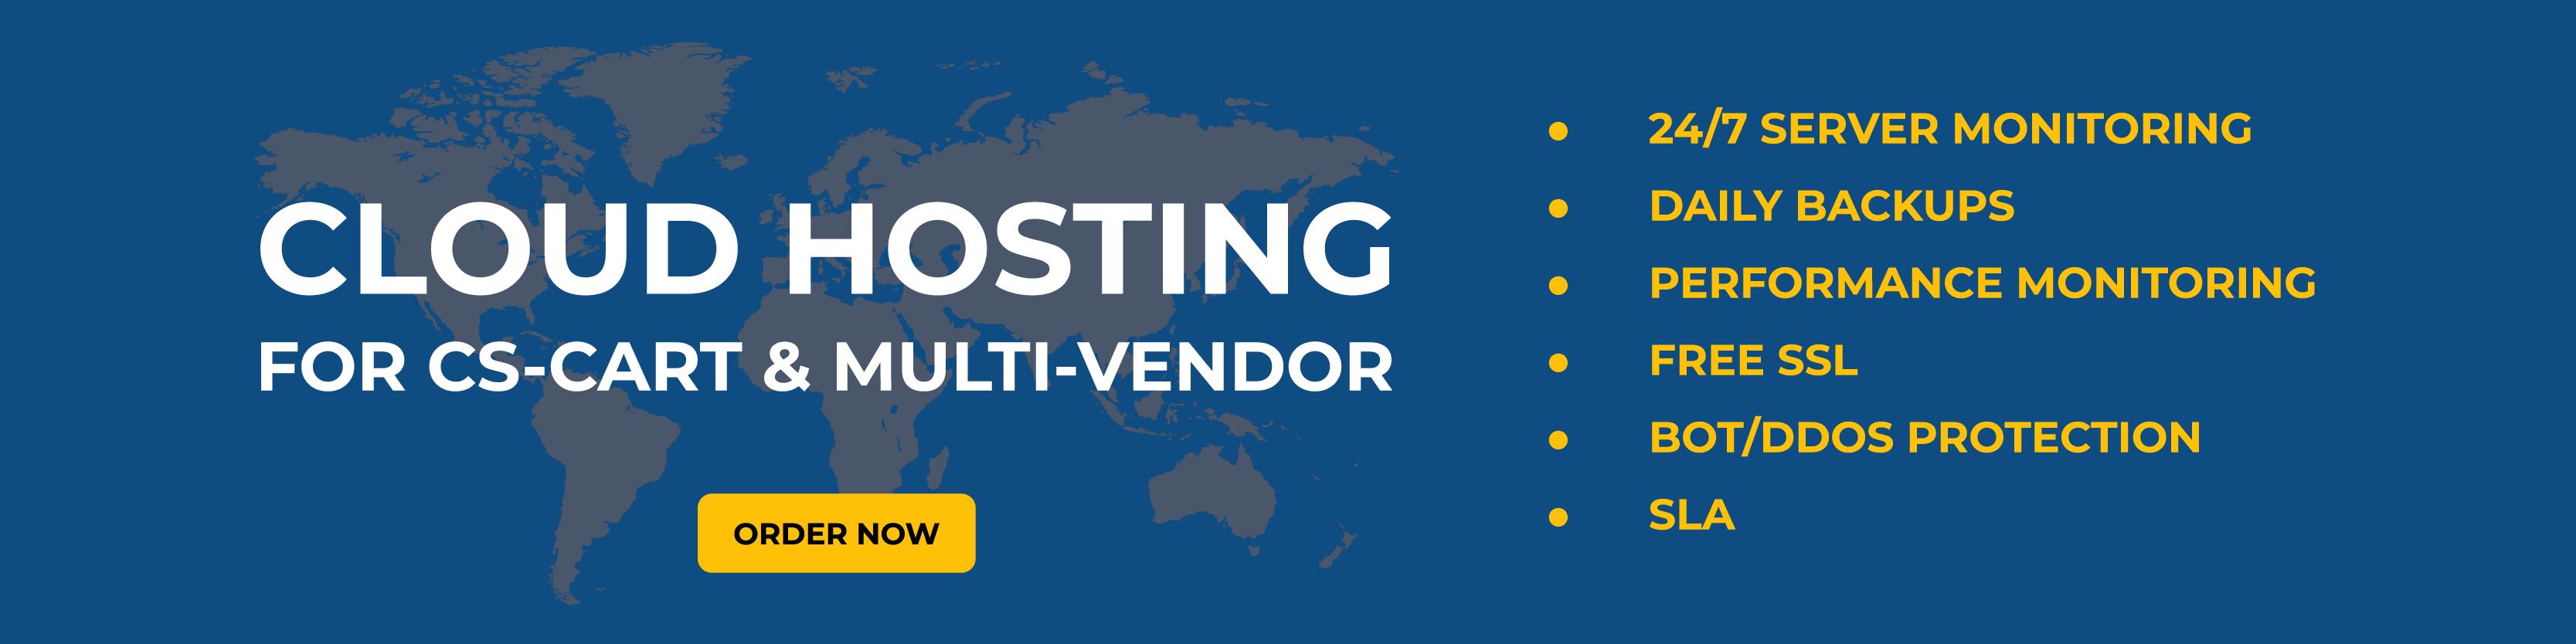 banner_cloud_hosting_for_cs-cart_and_multi-vendor